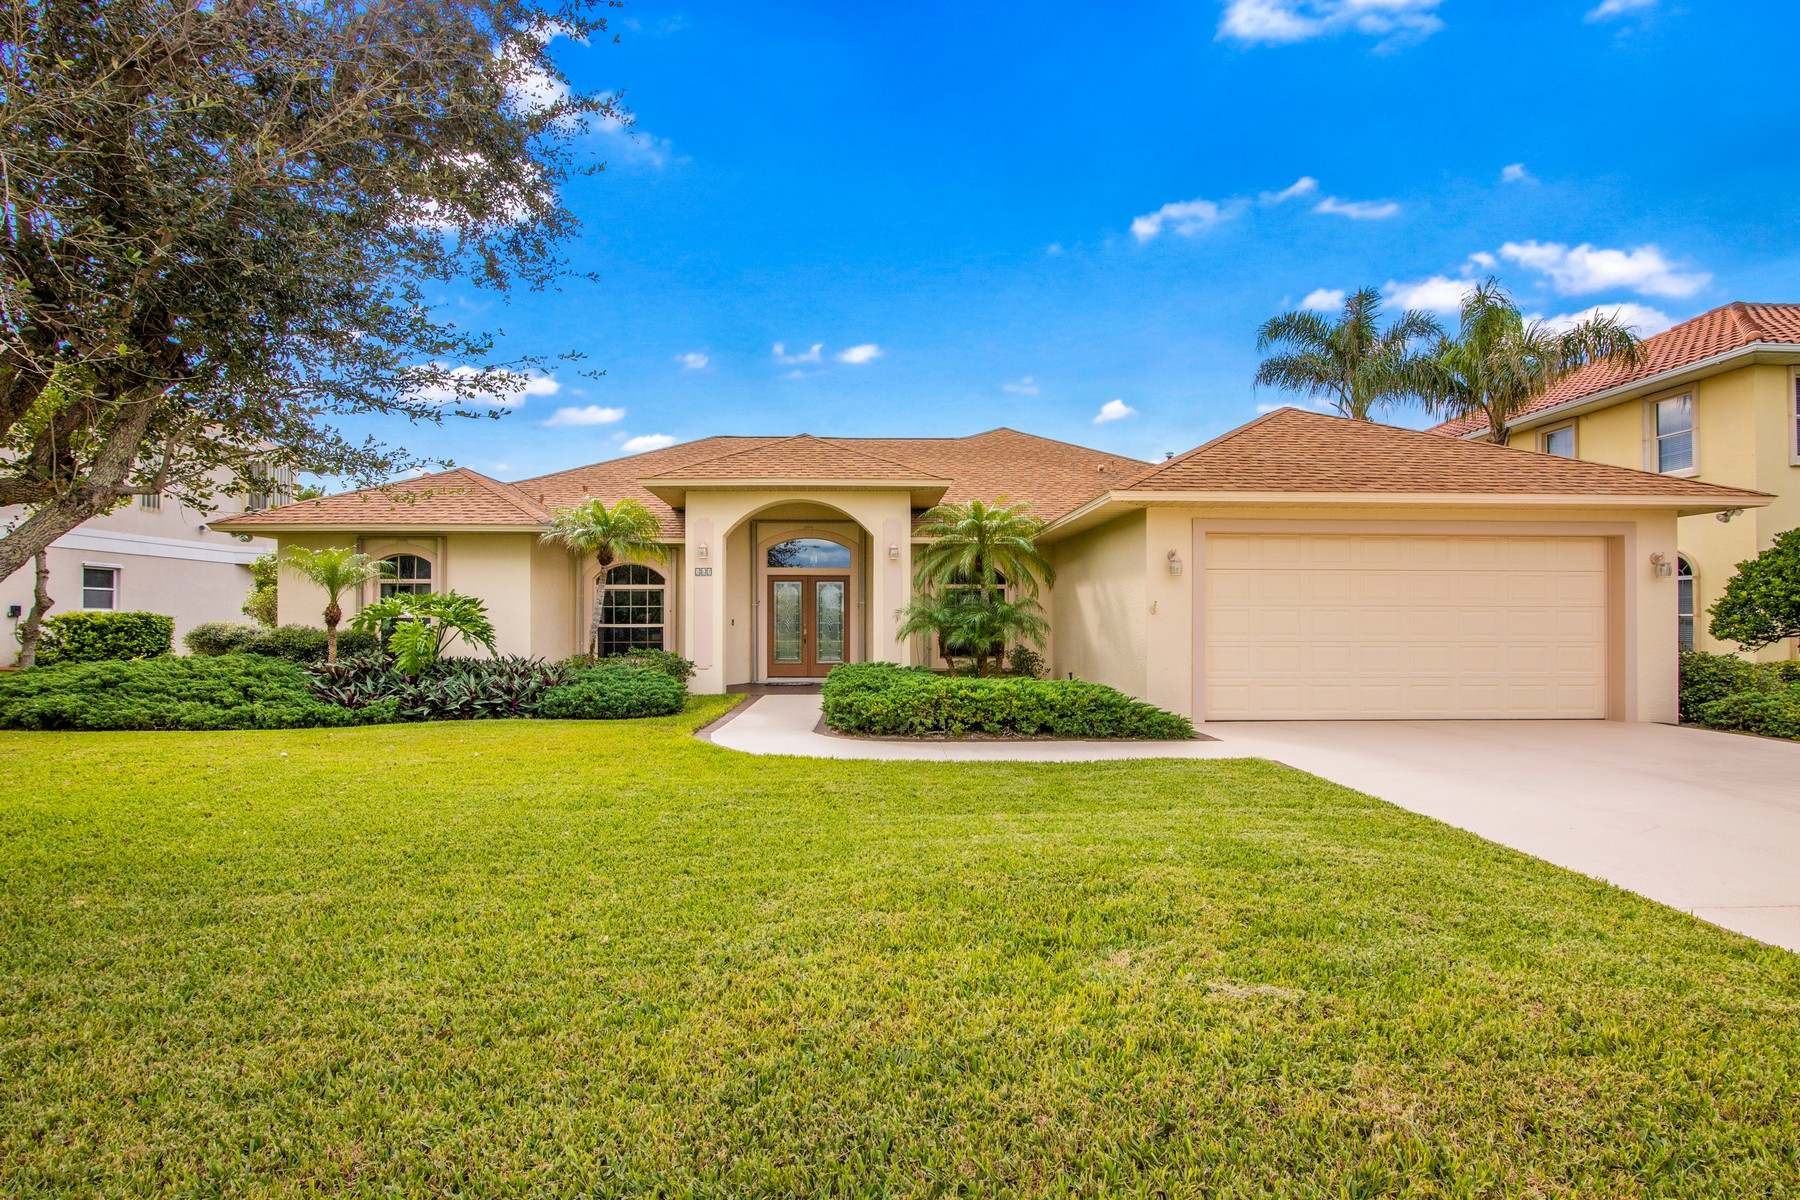 Open and Bright Home in Perfect Location 161 Seaglass Drive Melbourne Beach, Florida 32951 Hoa Kỳ